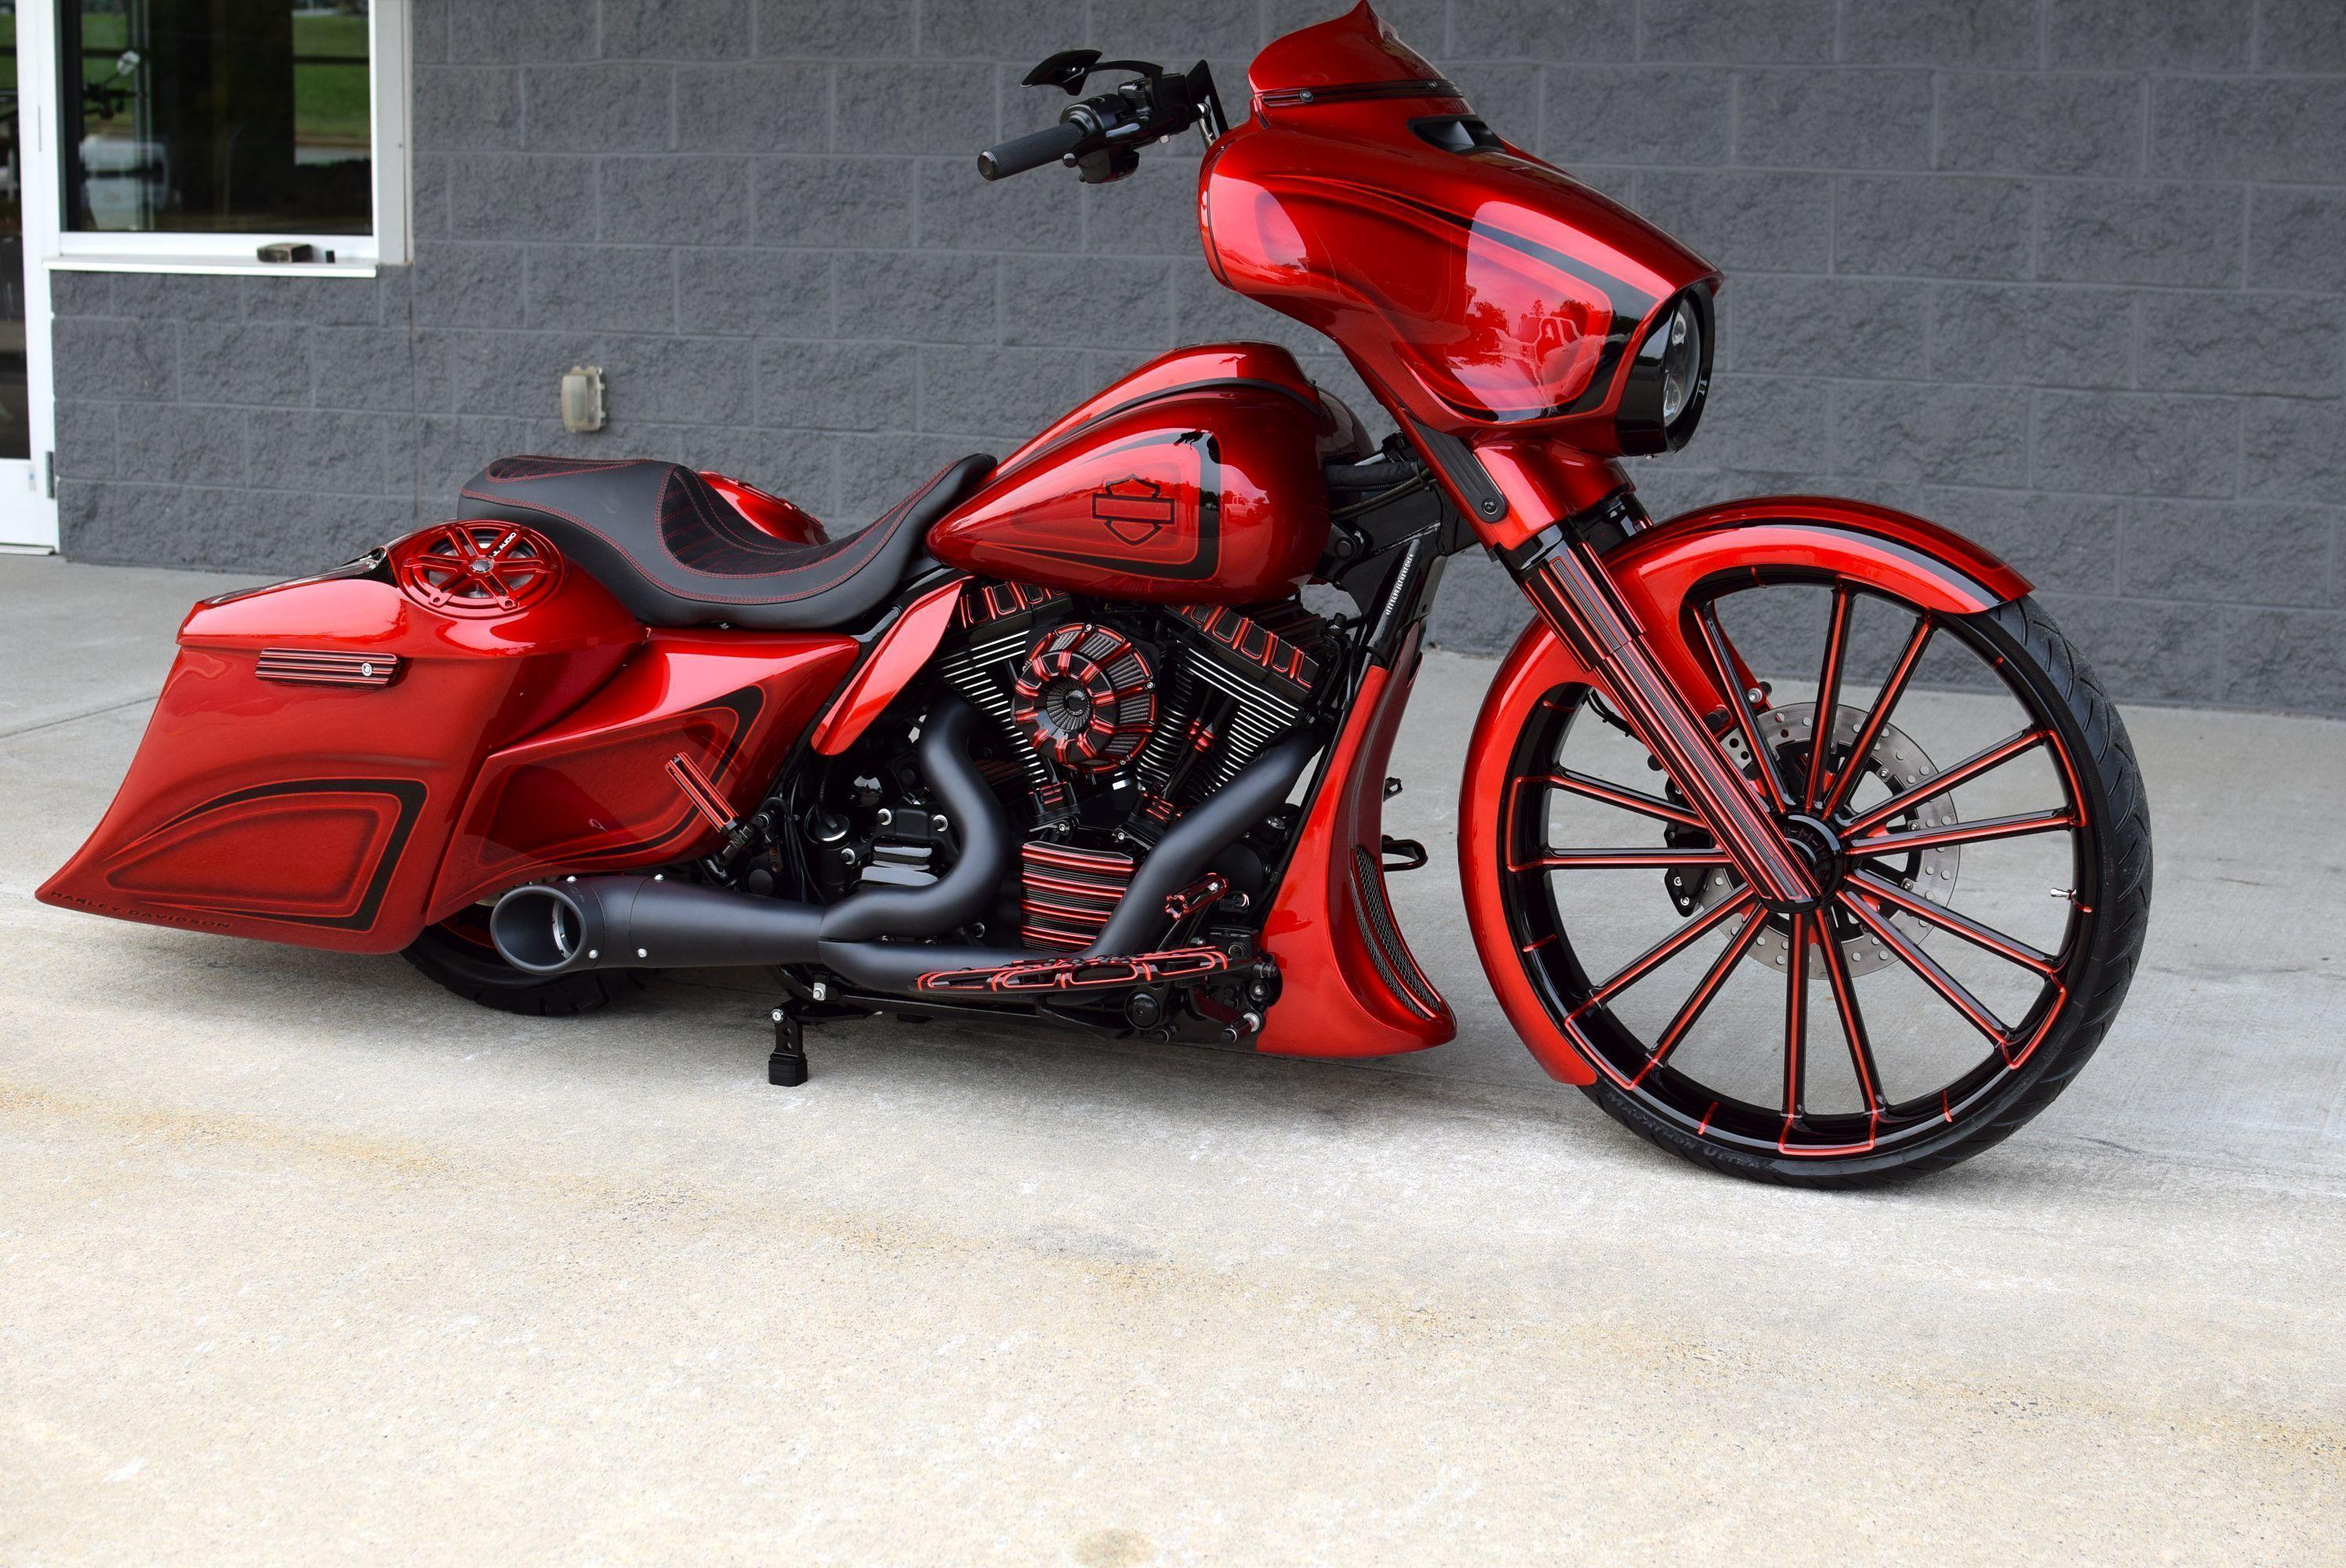 2016 Harley Davidson Street Glide Custom